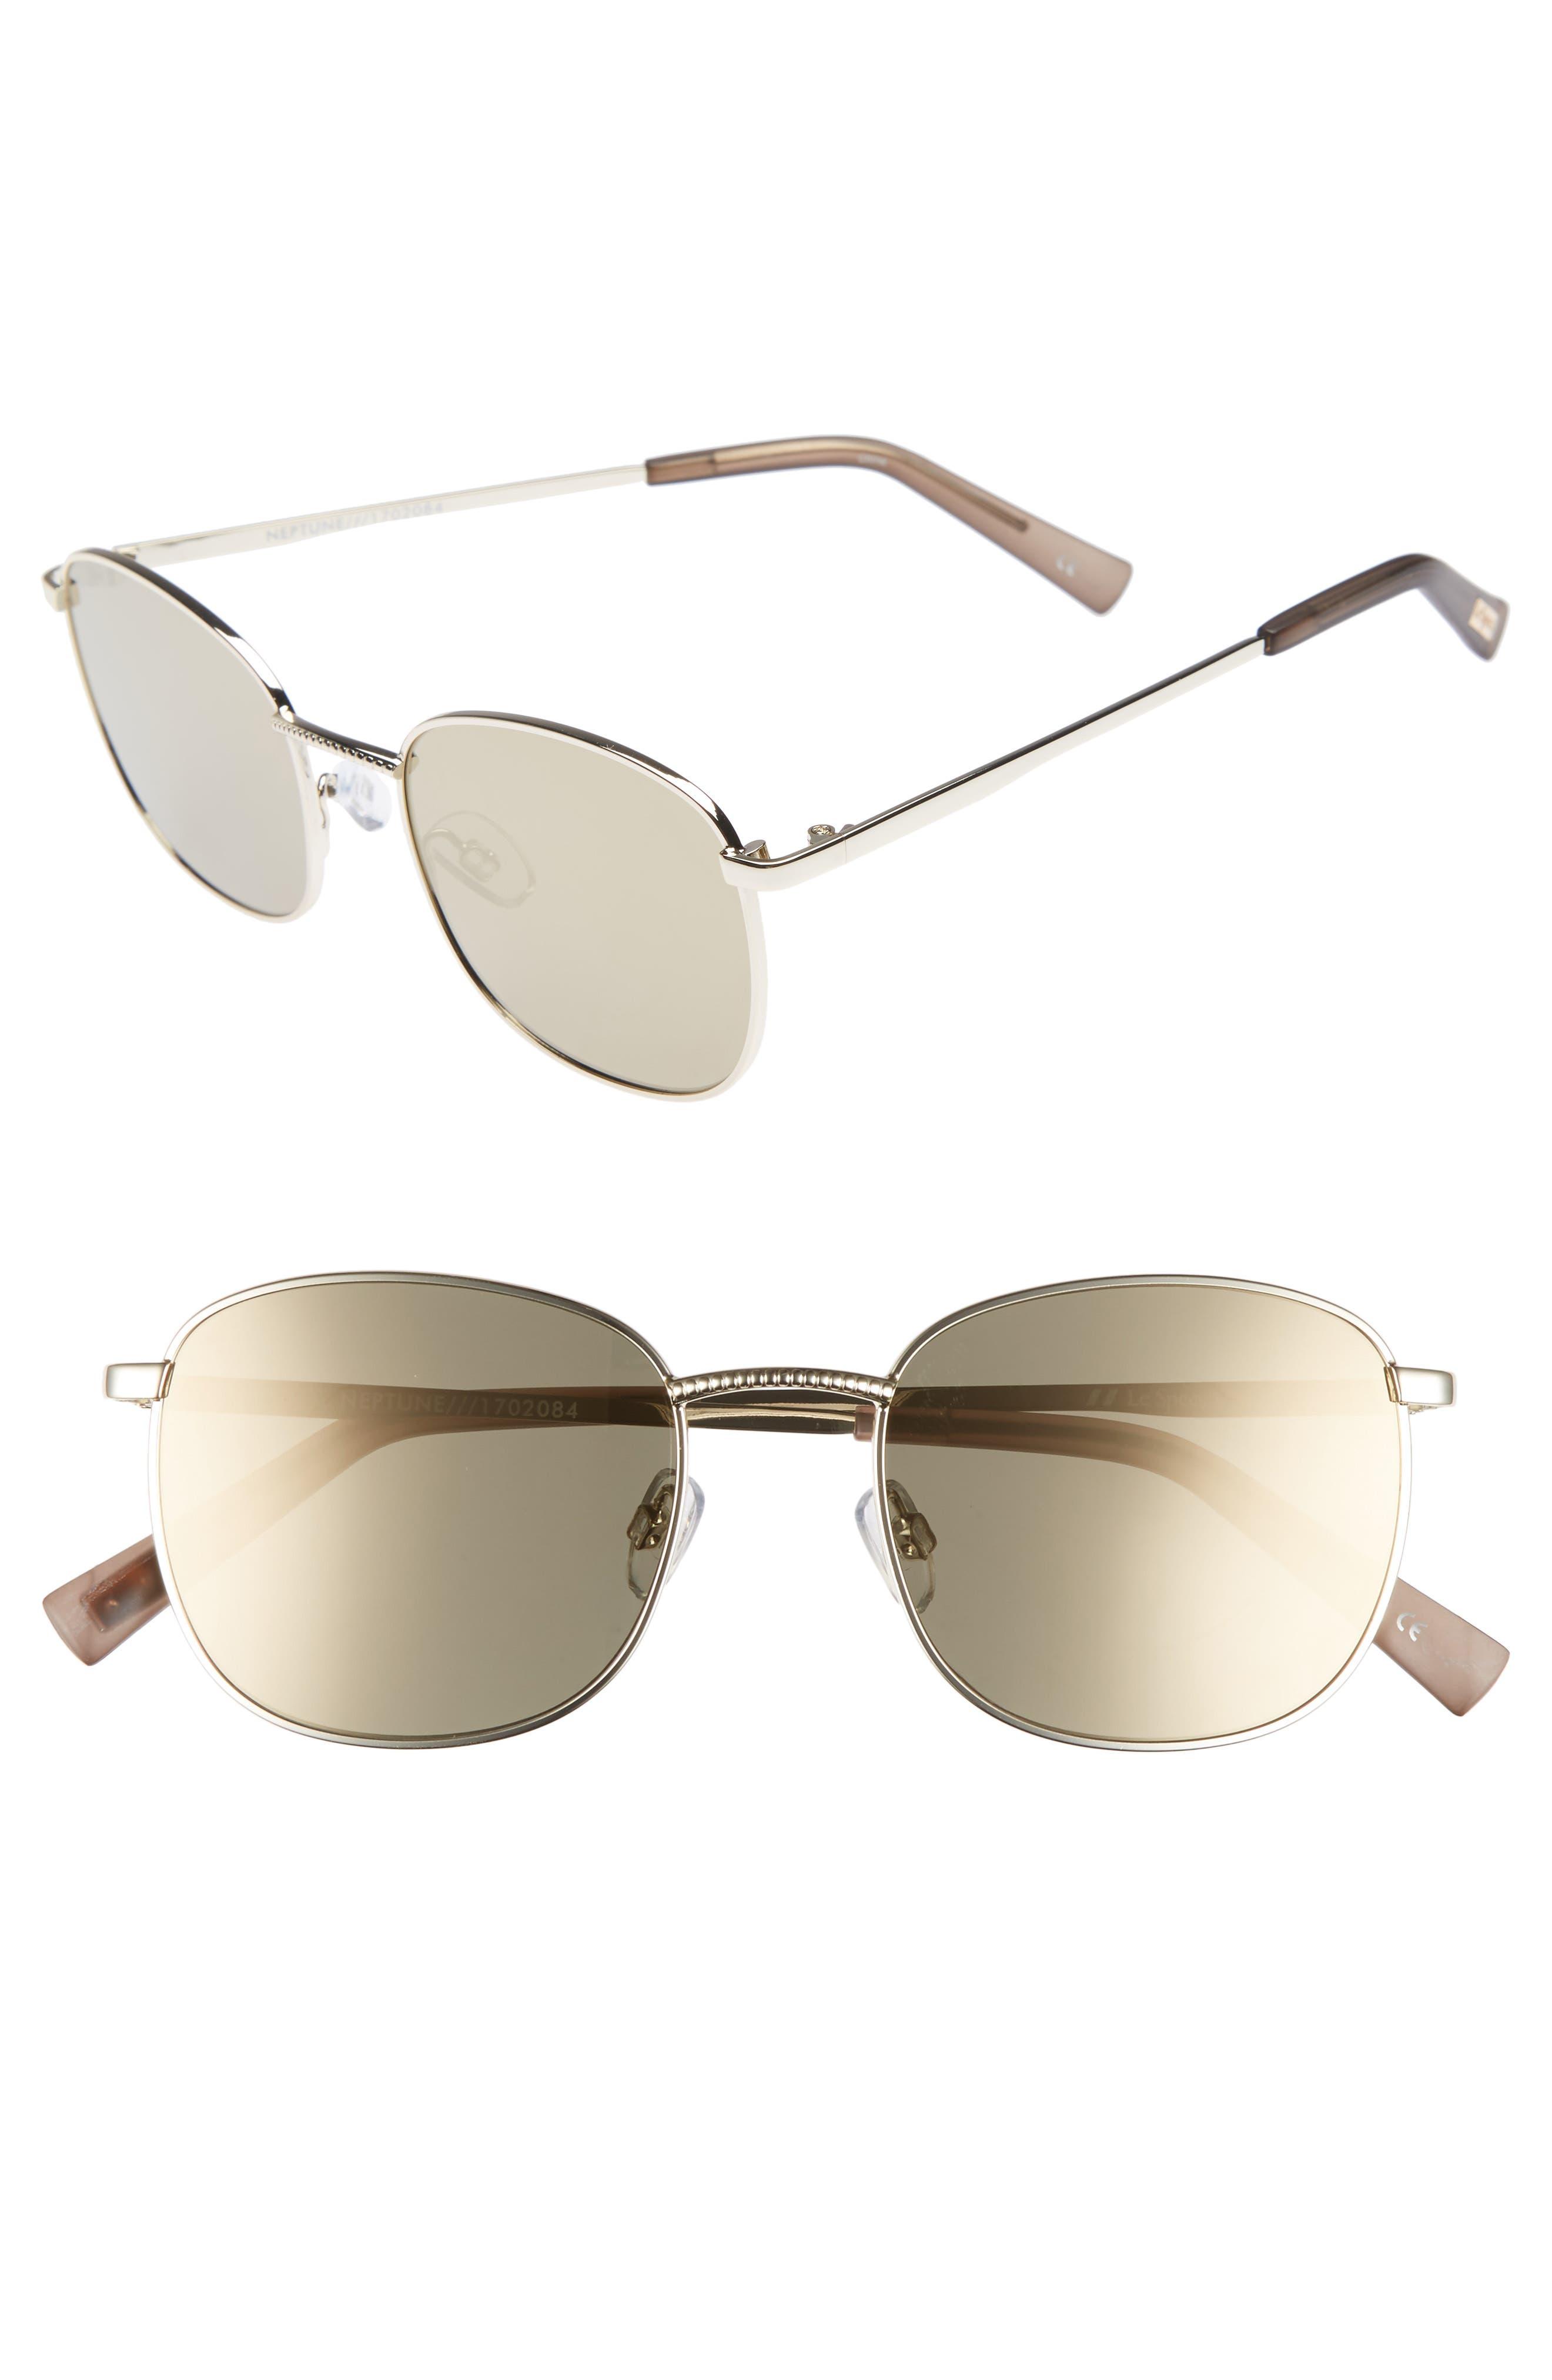 Main Image - Le Specs Neptune 49mm Sunglasses